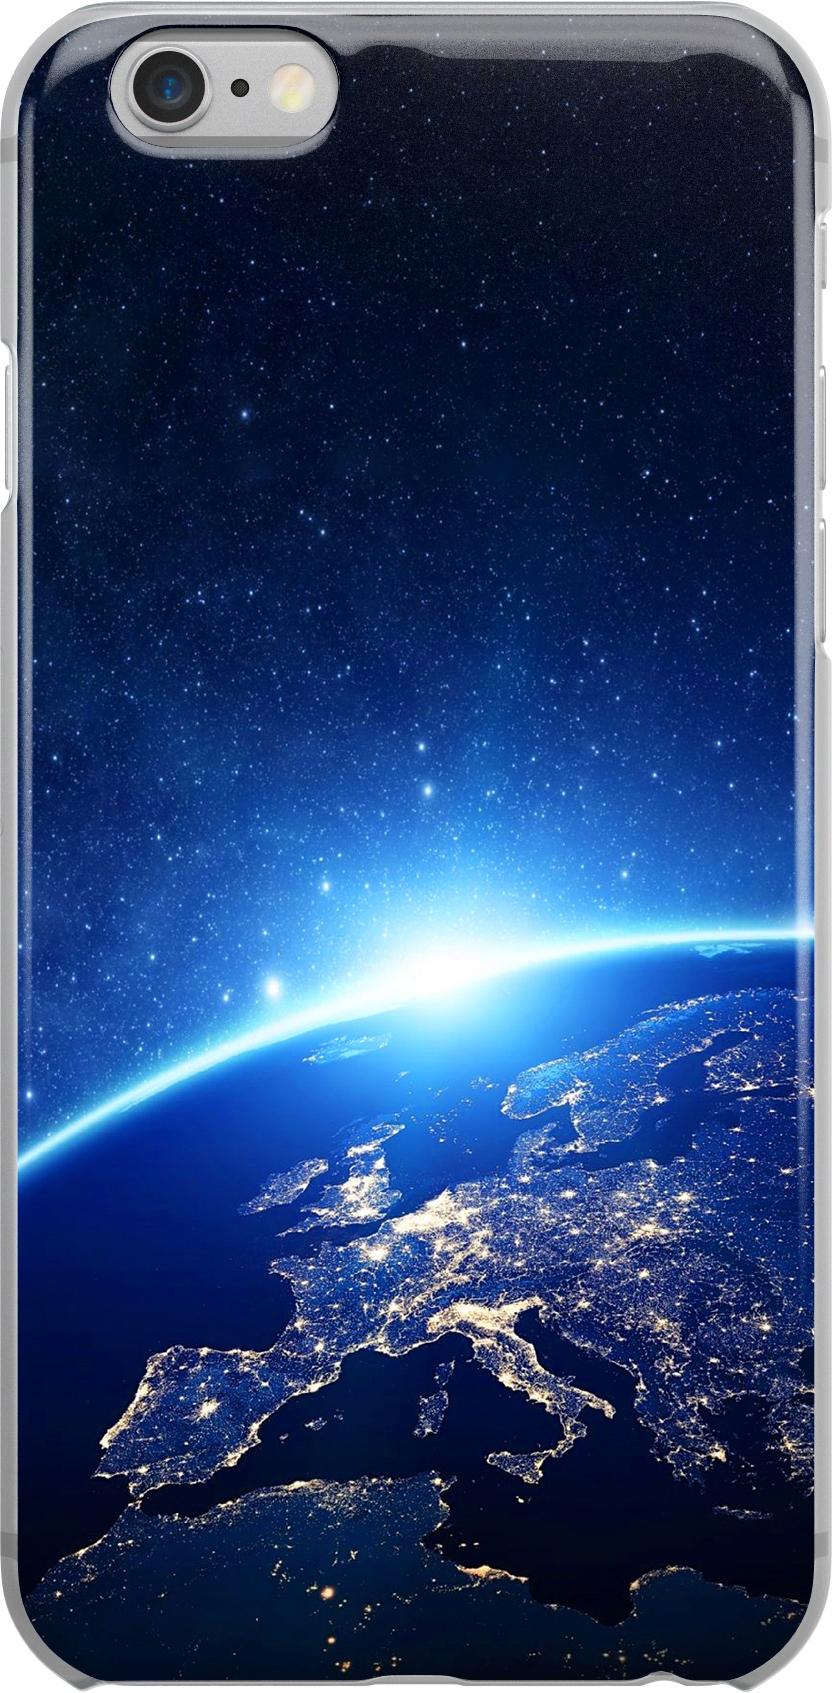 Etui Wzory Space Huawei Y625